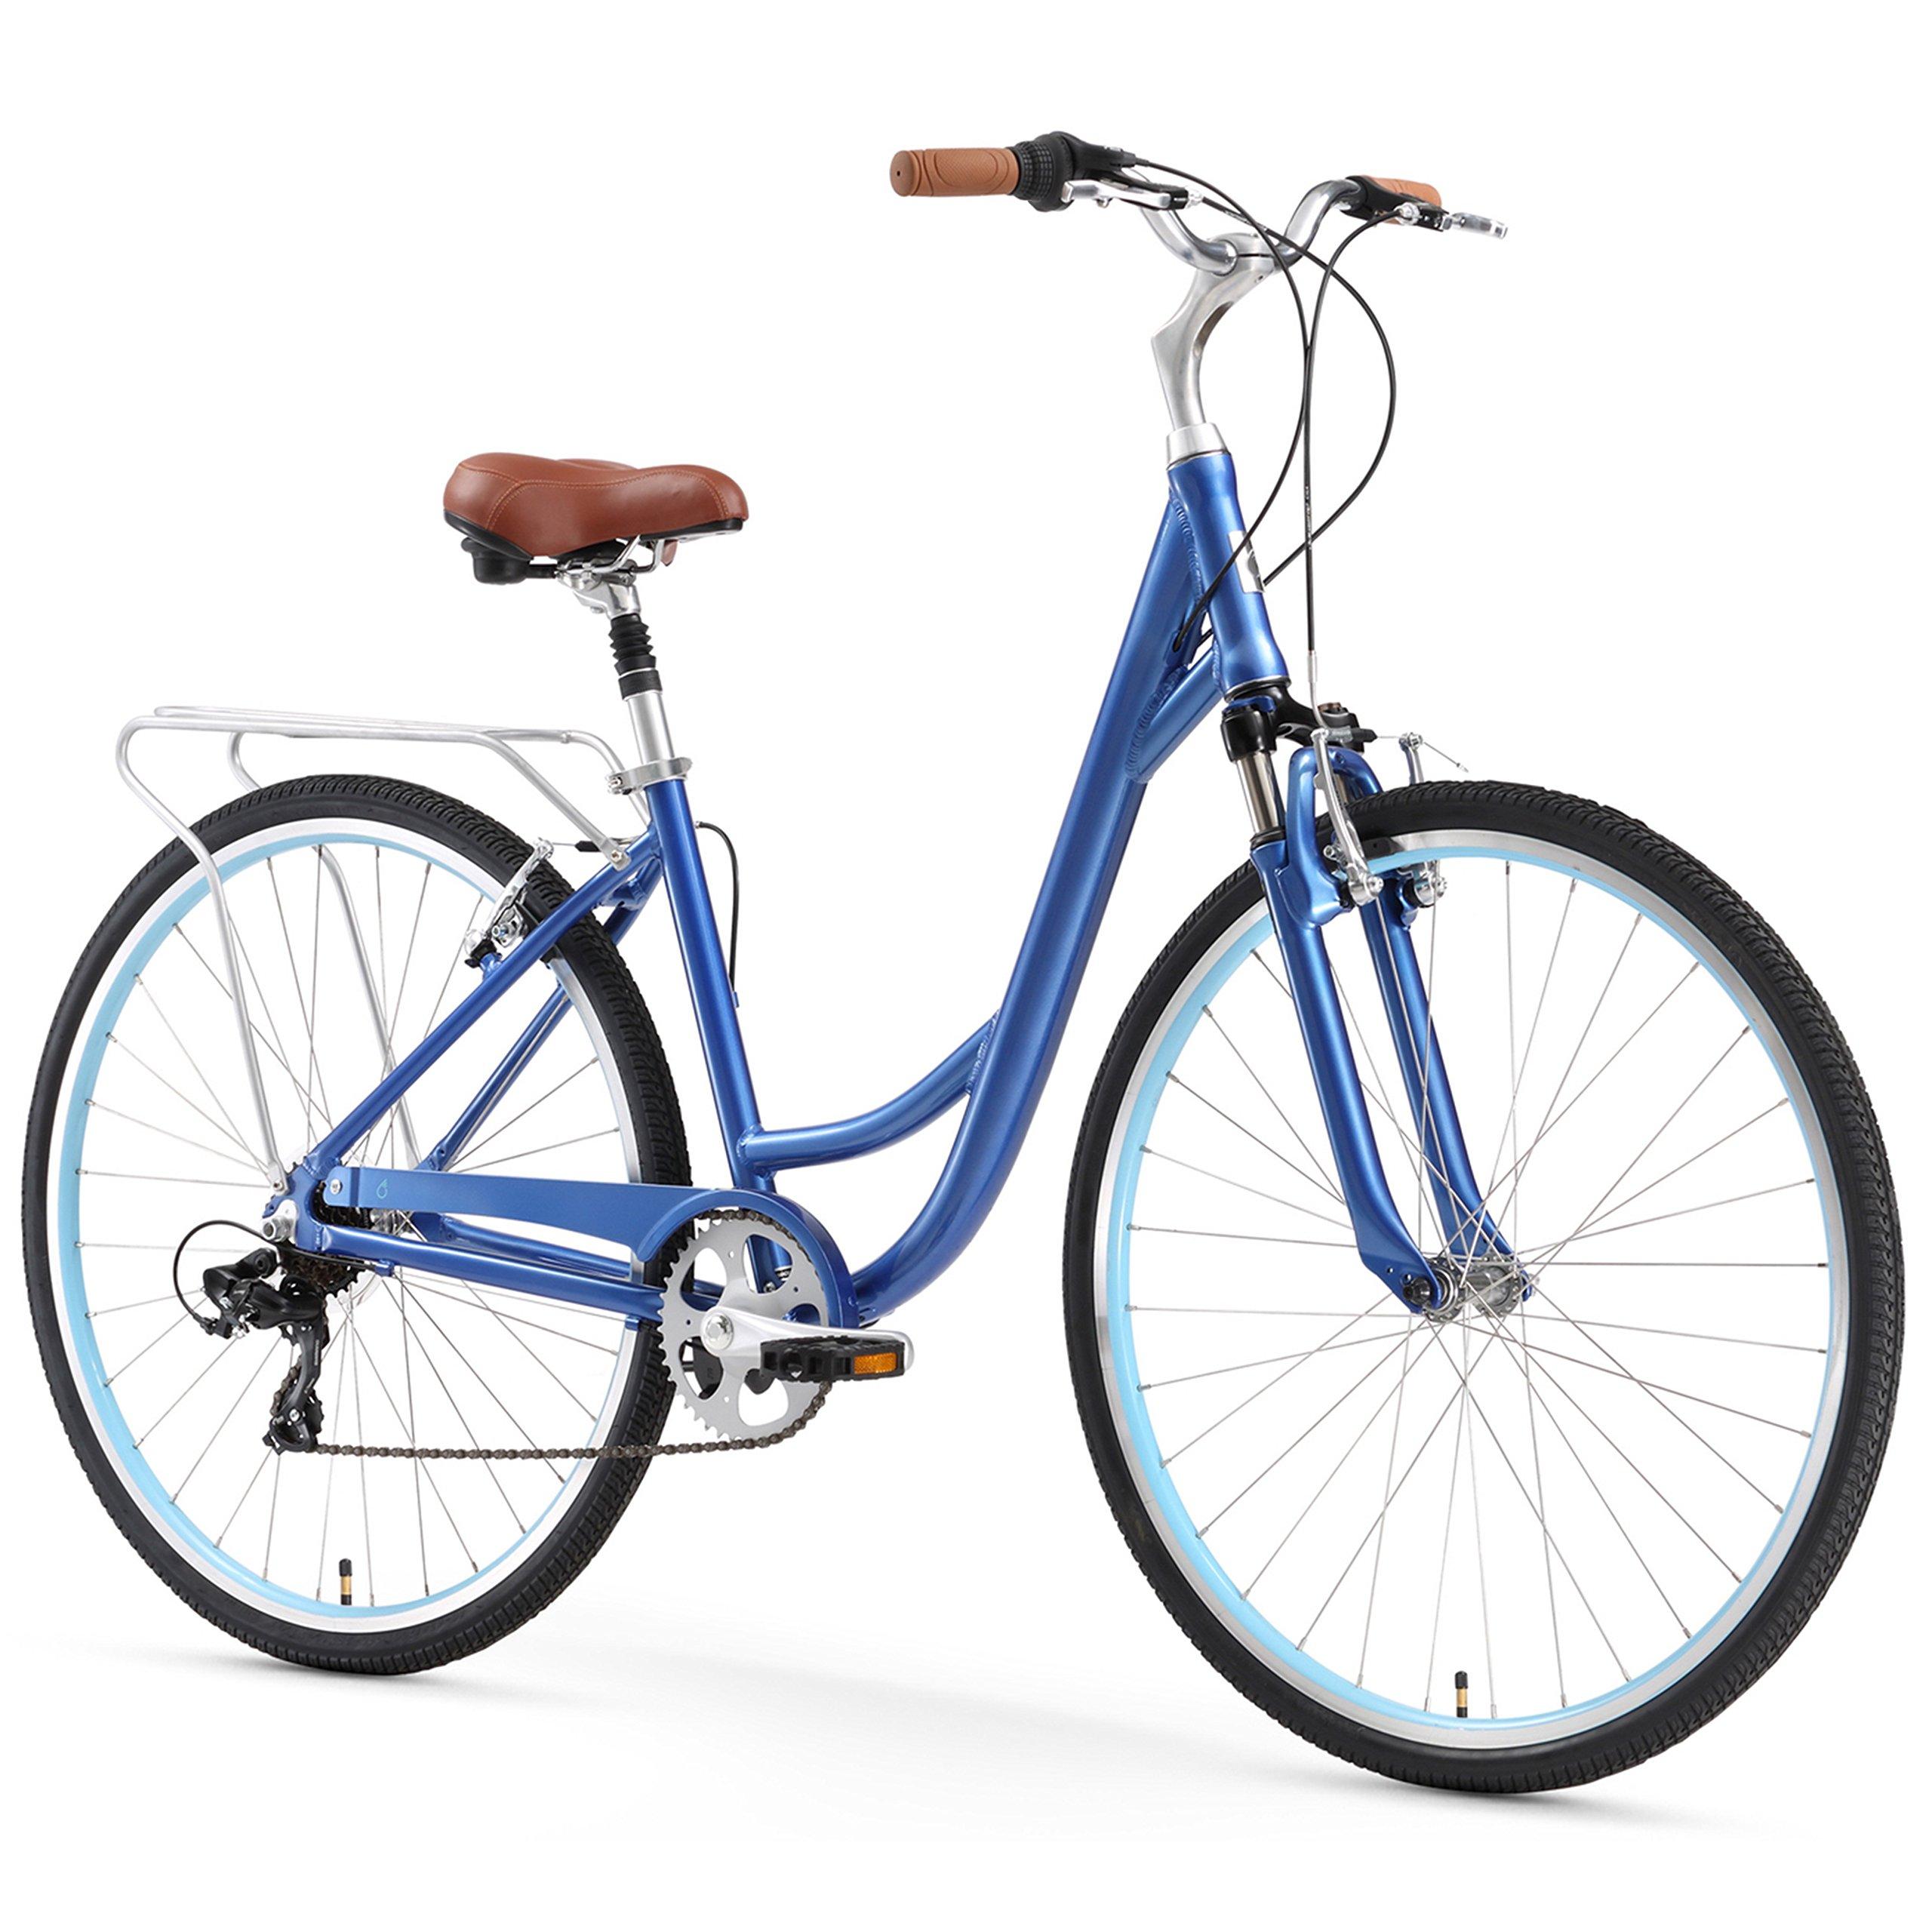 sixthreezero Body Ease Women's 7-Speed Comfort Bike, Navy Blue